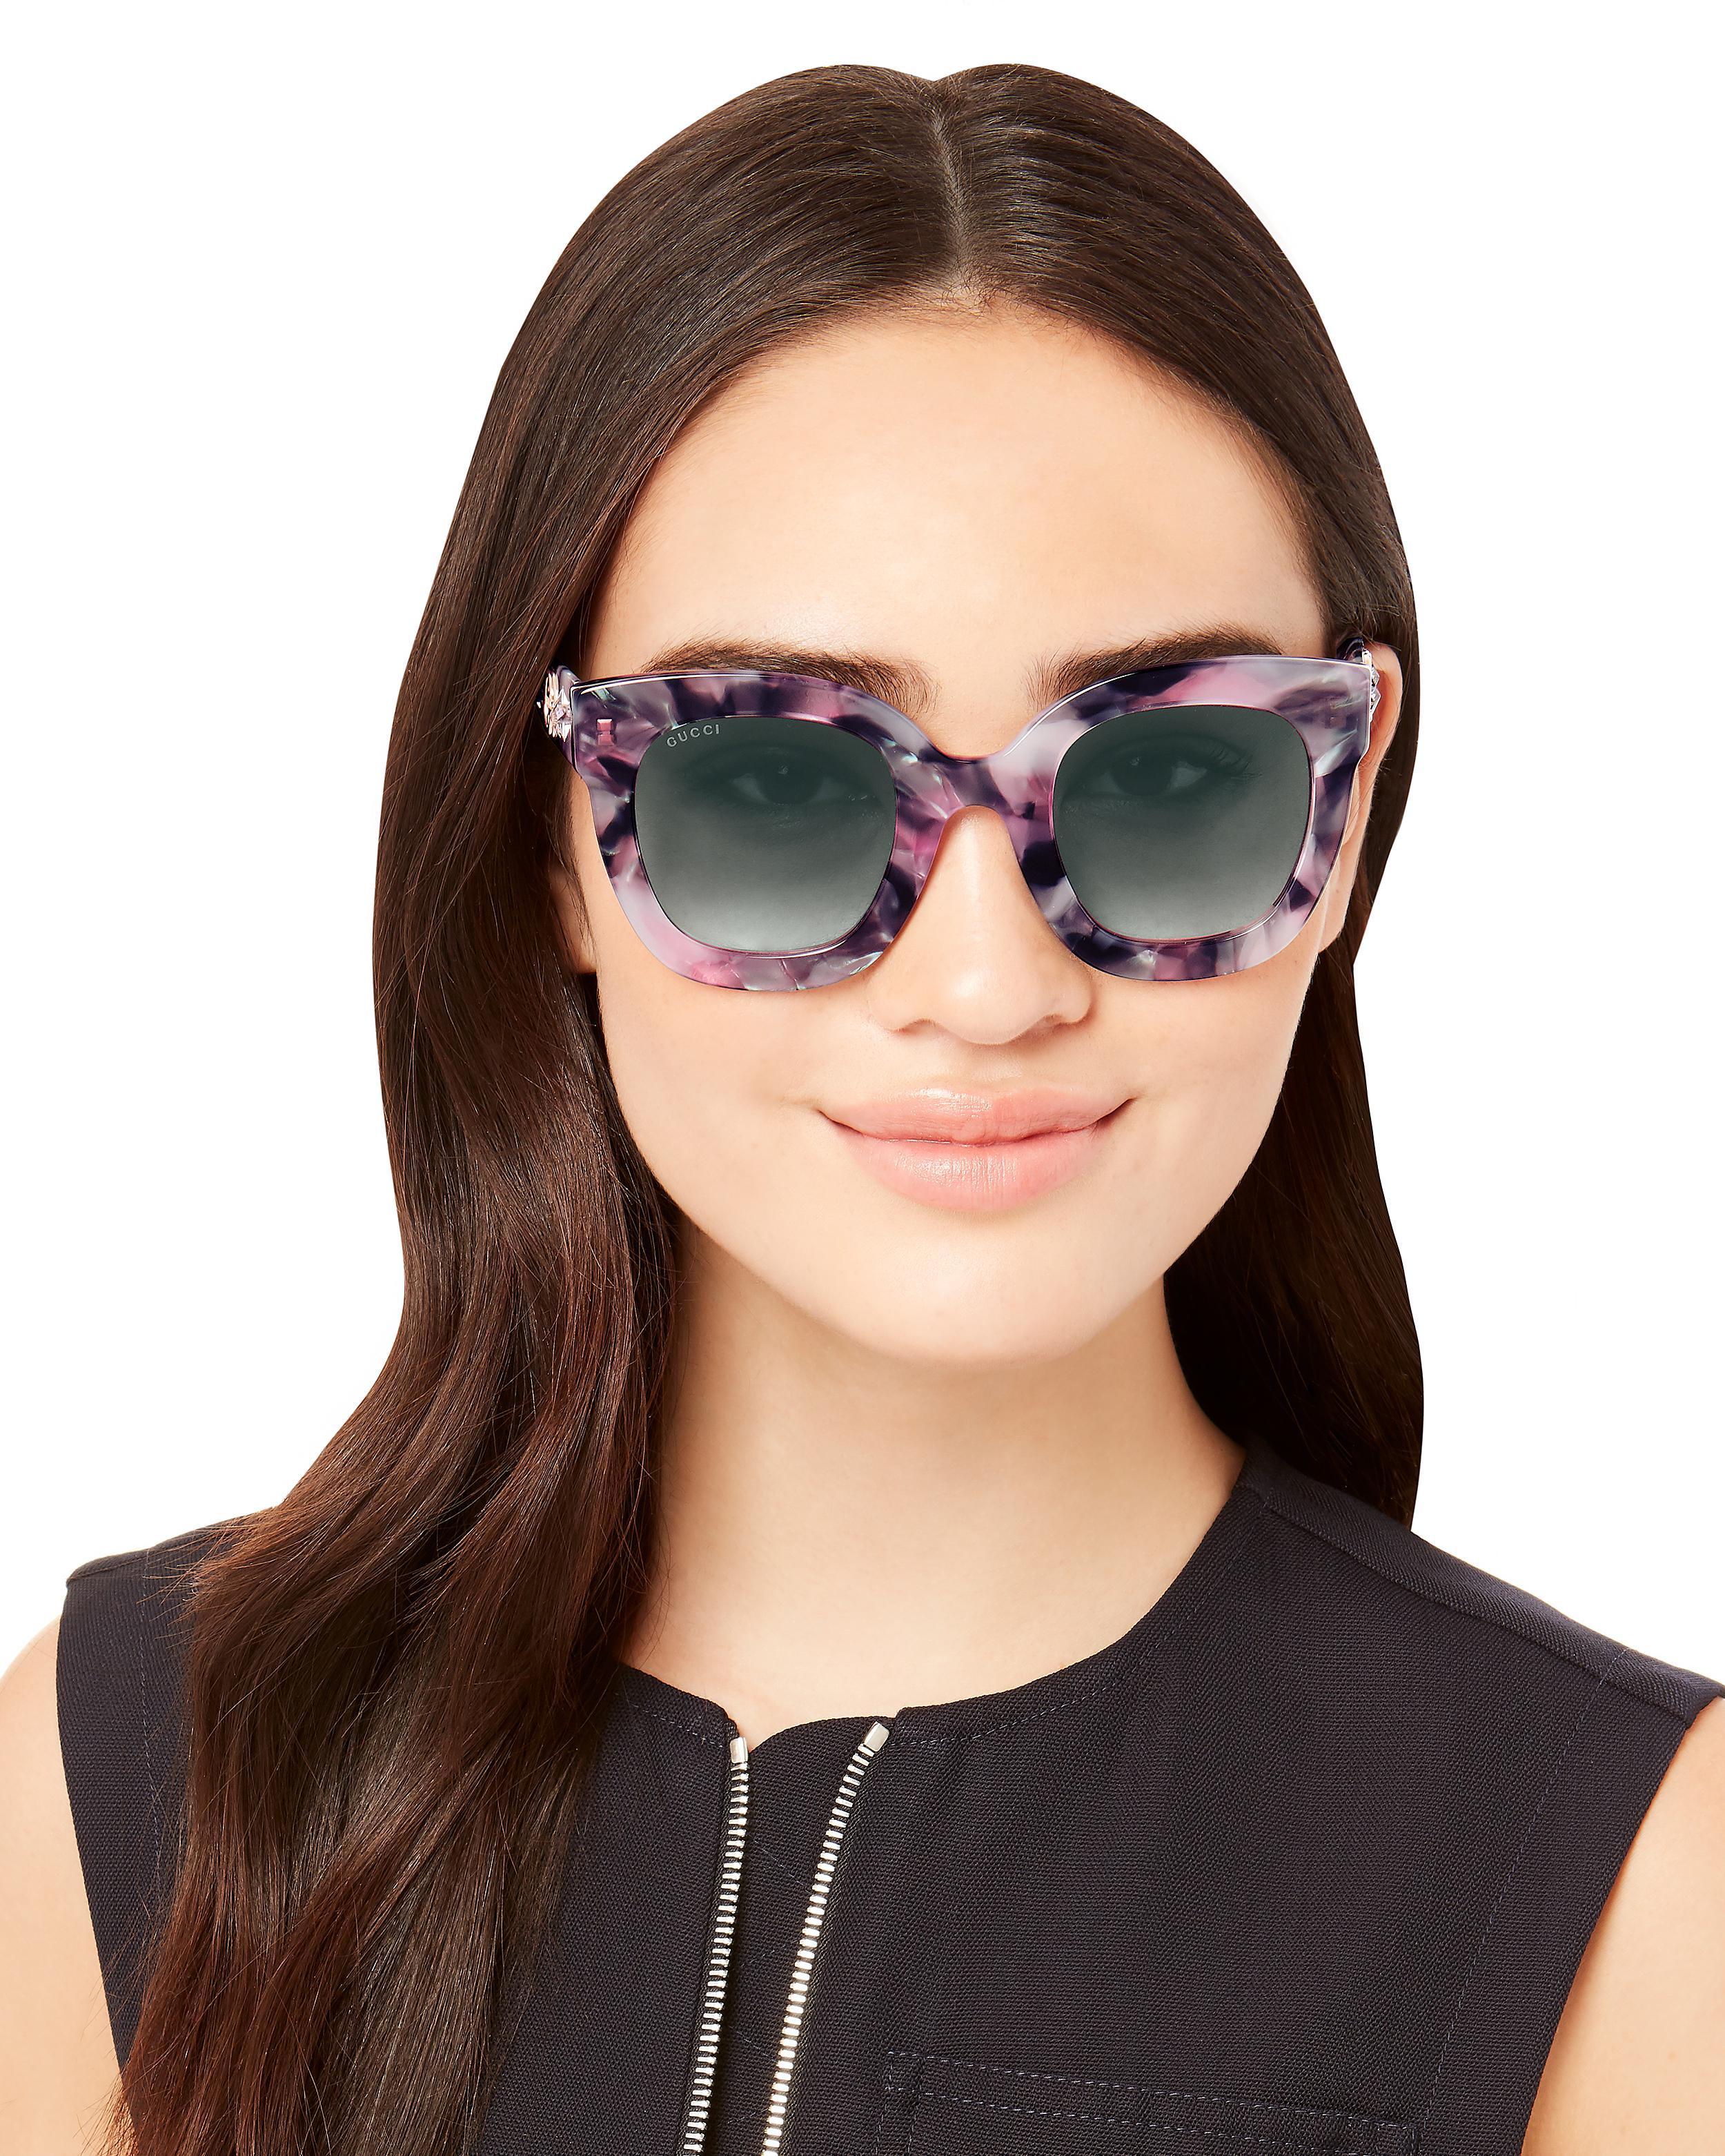 24f032583e2 Gucci Oversized Marble Acetate Sunglasses - Save 4% - Lyst